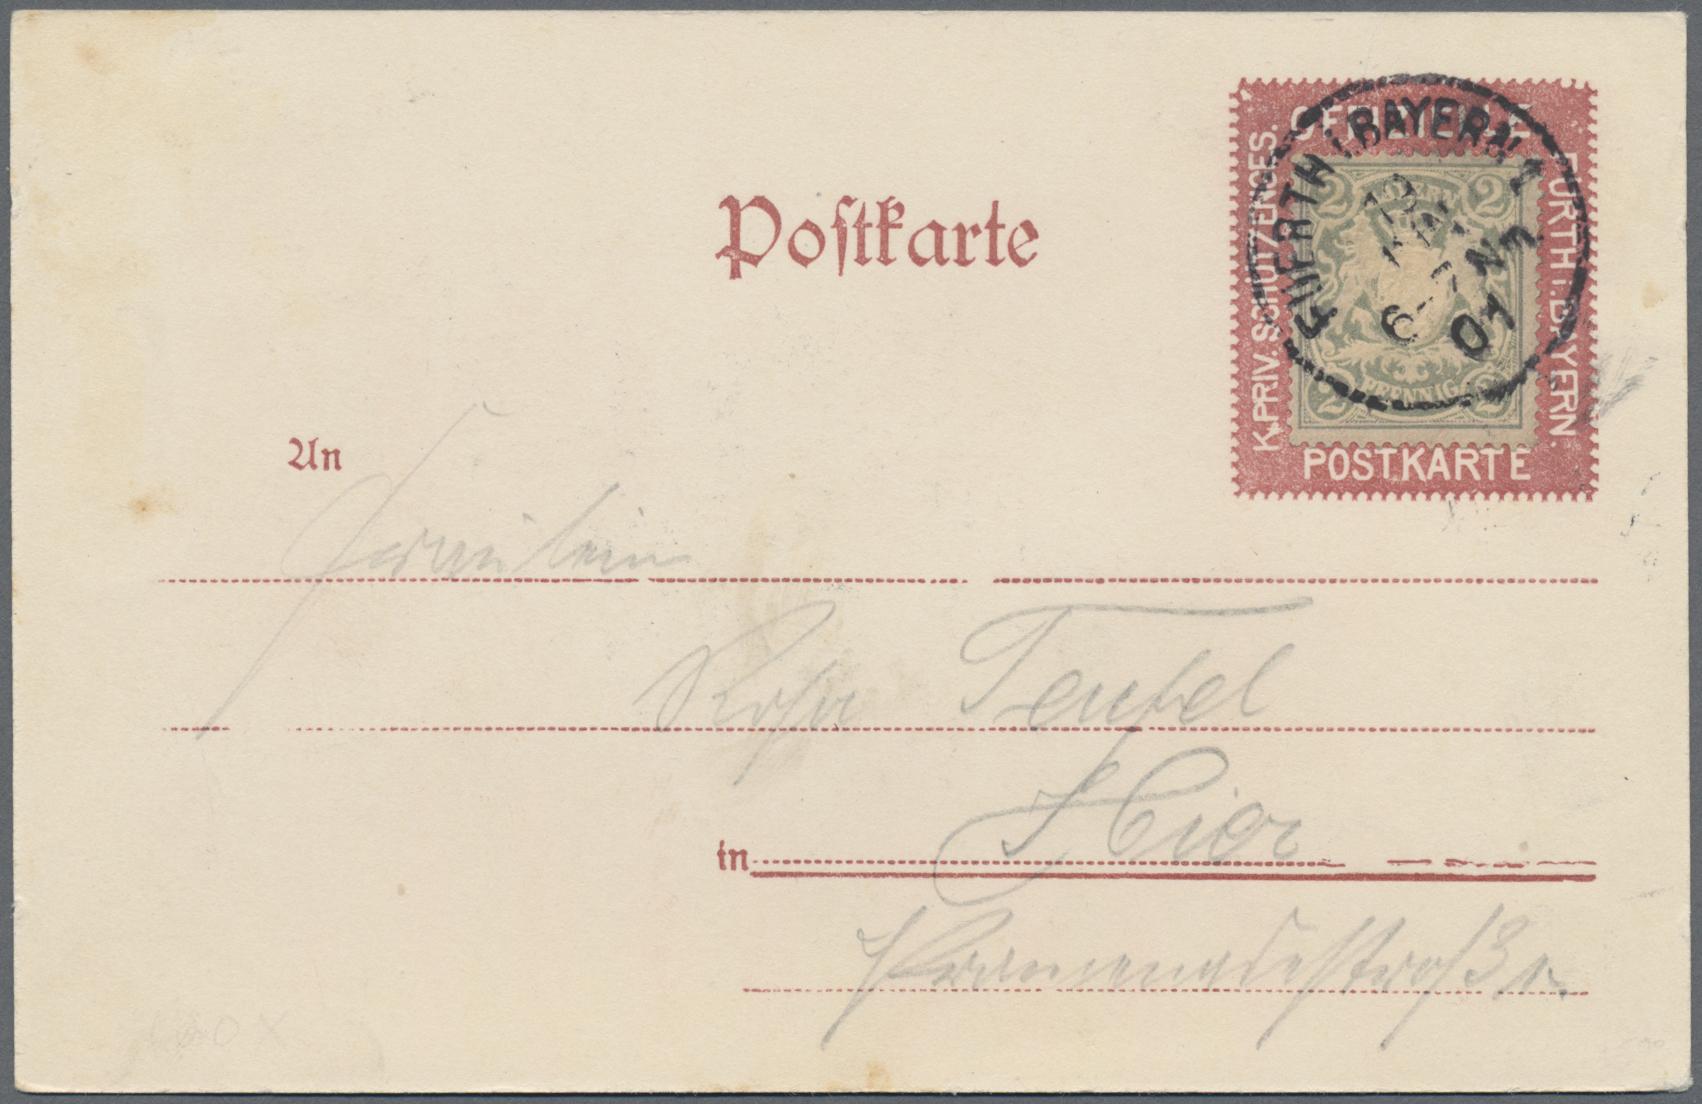 Lot 36175 - Bayern - Marken und Briefe  -  Auktionshaus Christoph Gärtner GmbH & Co. KG Sale #44 Collections Germany